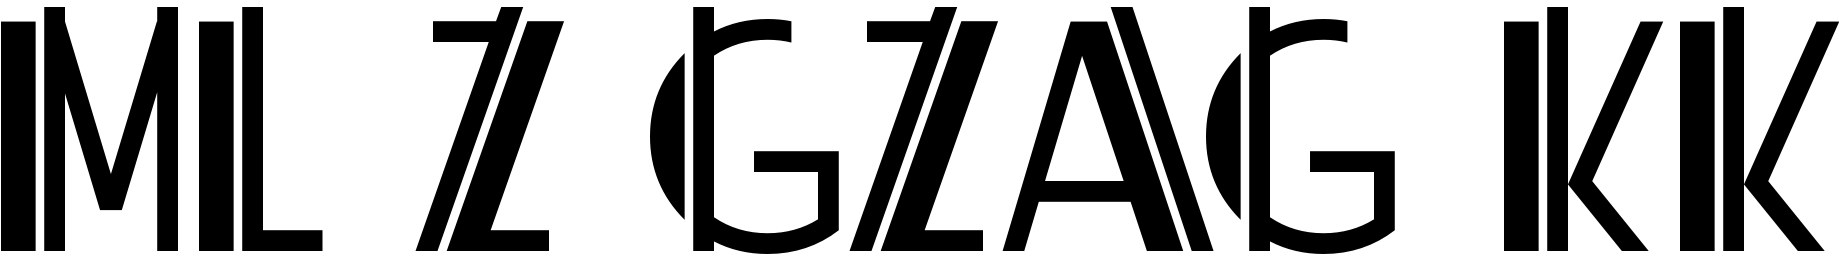 ML ZigZag KK